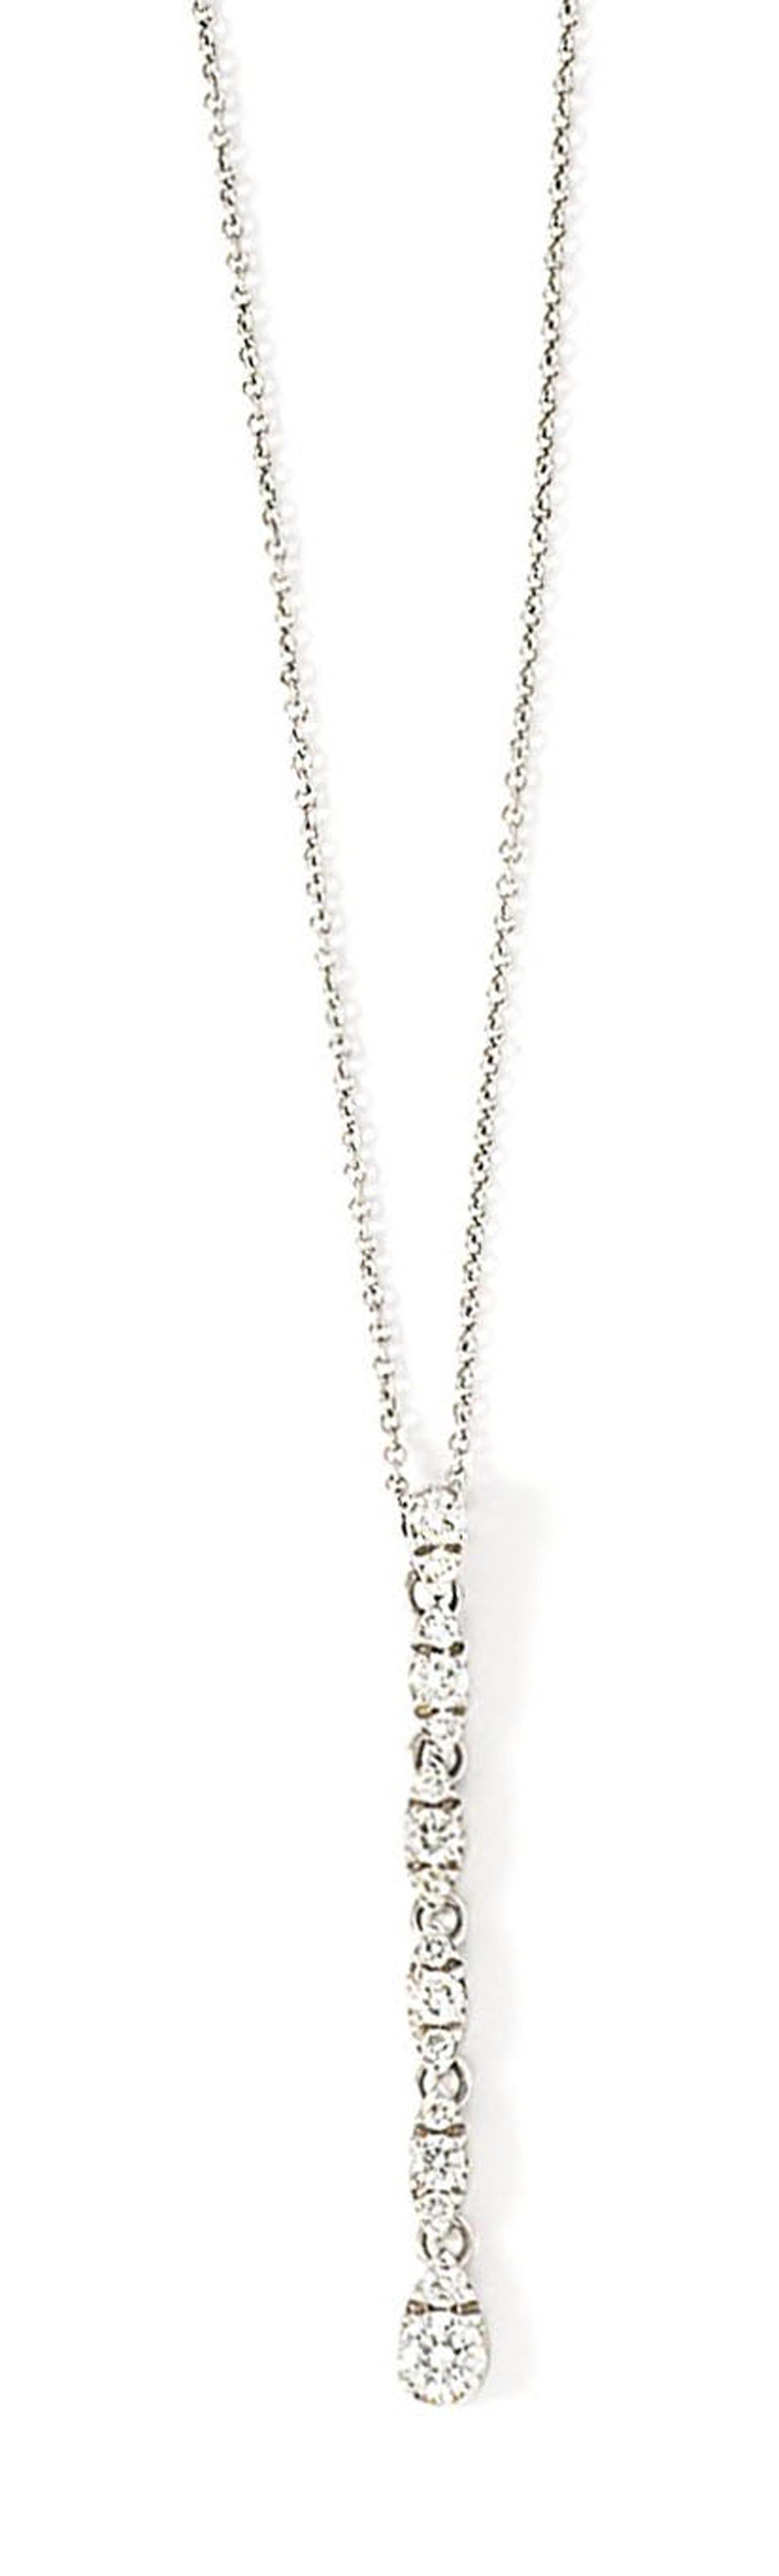 A diamond-set pendant necklace, by Pasquale Bruni